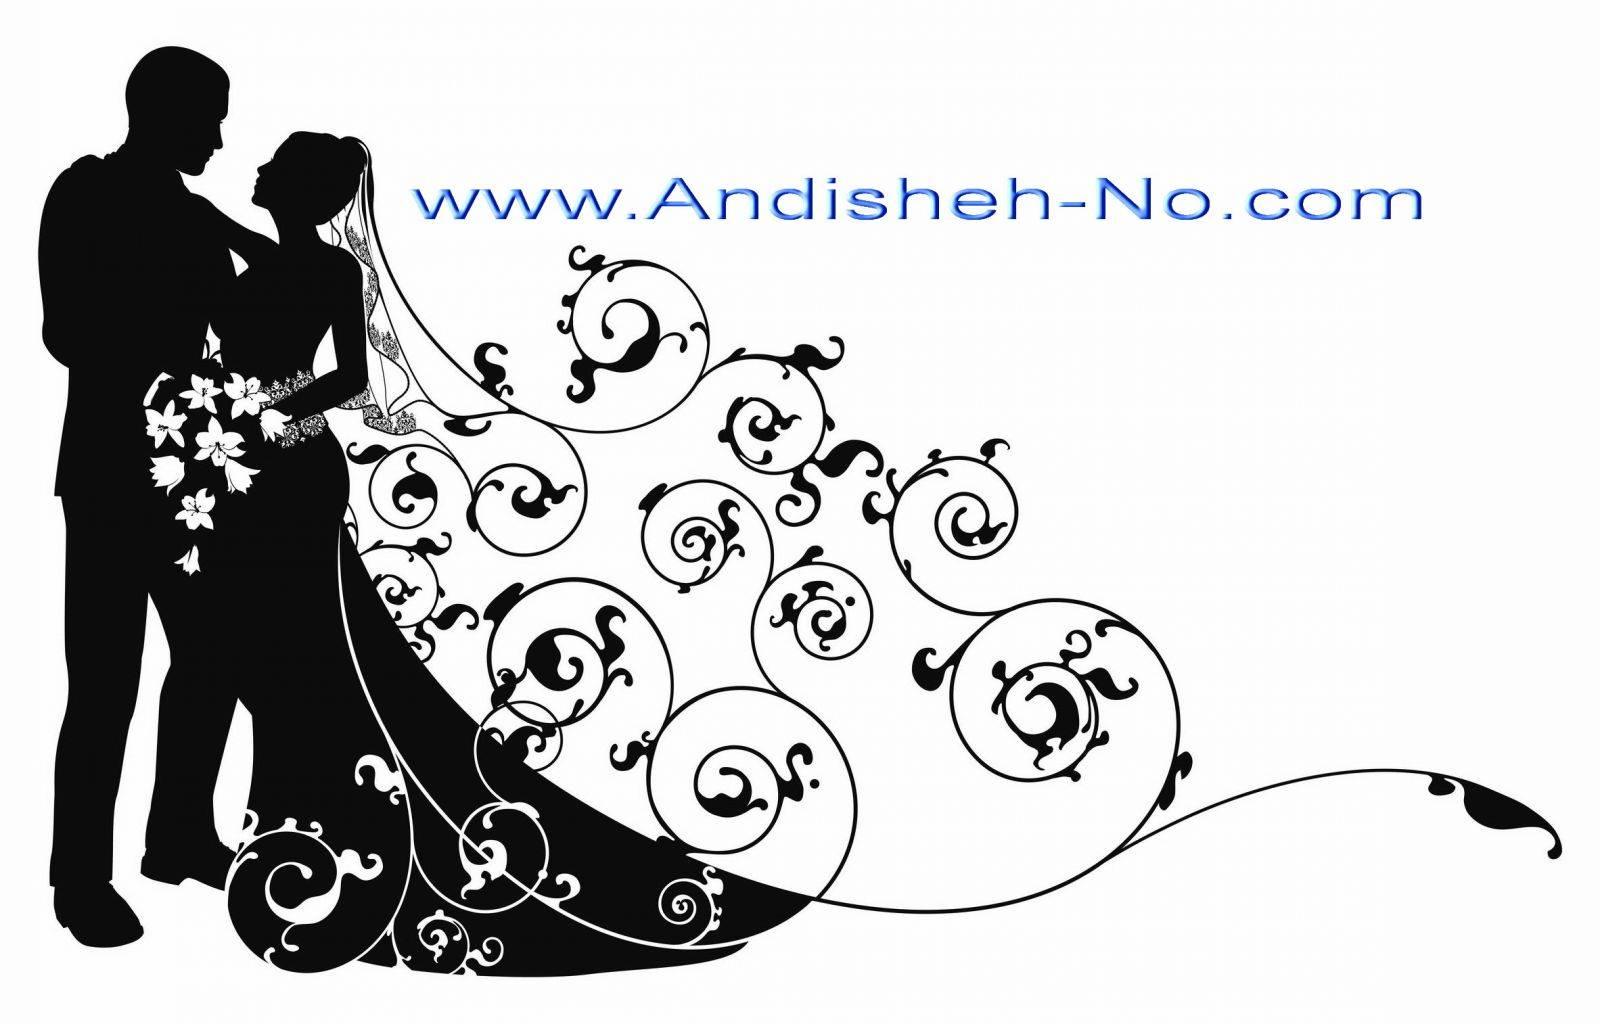 brideandgroom20201320andisheh no com - فروش لباس عروس دسته دوم و کار کرده عروس خانم ها